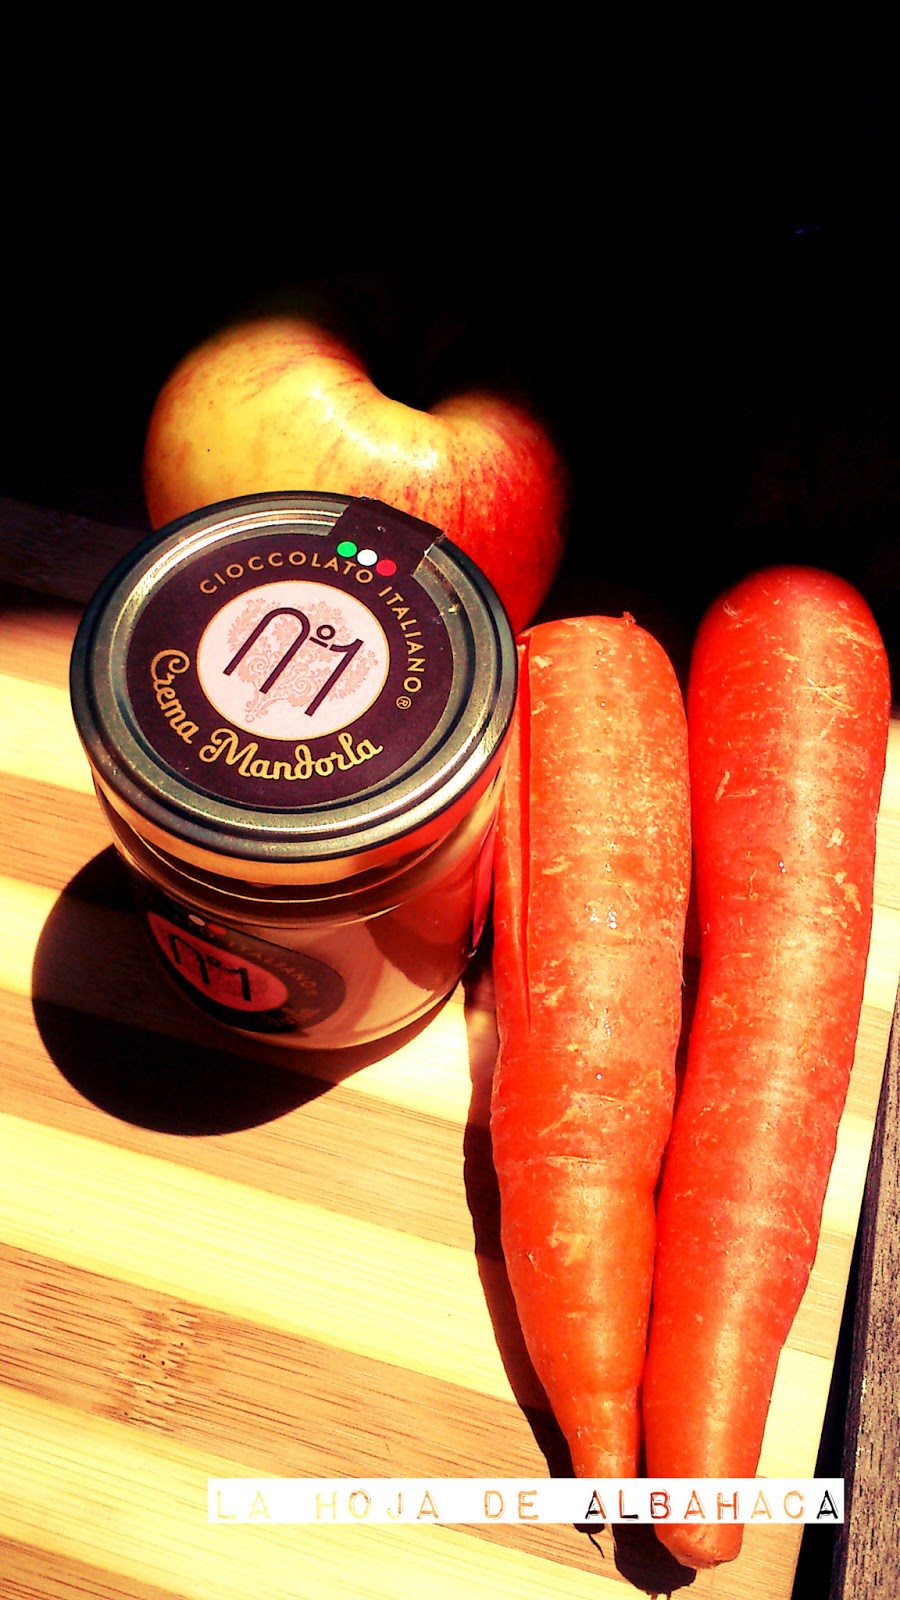 Batido de zanahoria, manzana,crema de almendras, recetas vegetariana, cioccolato italiano